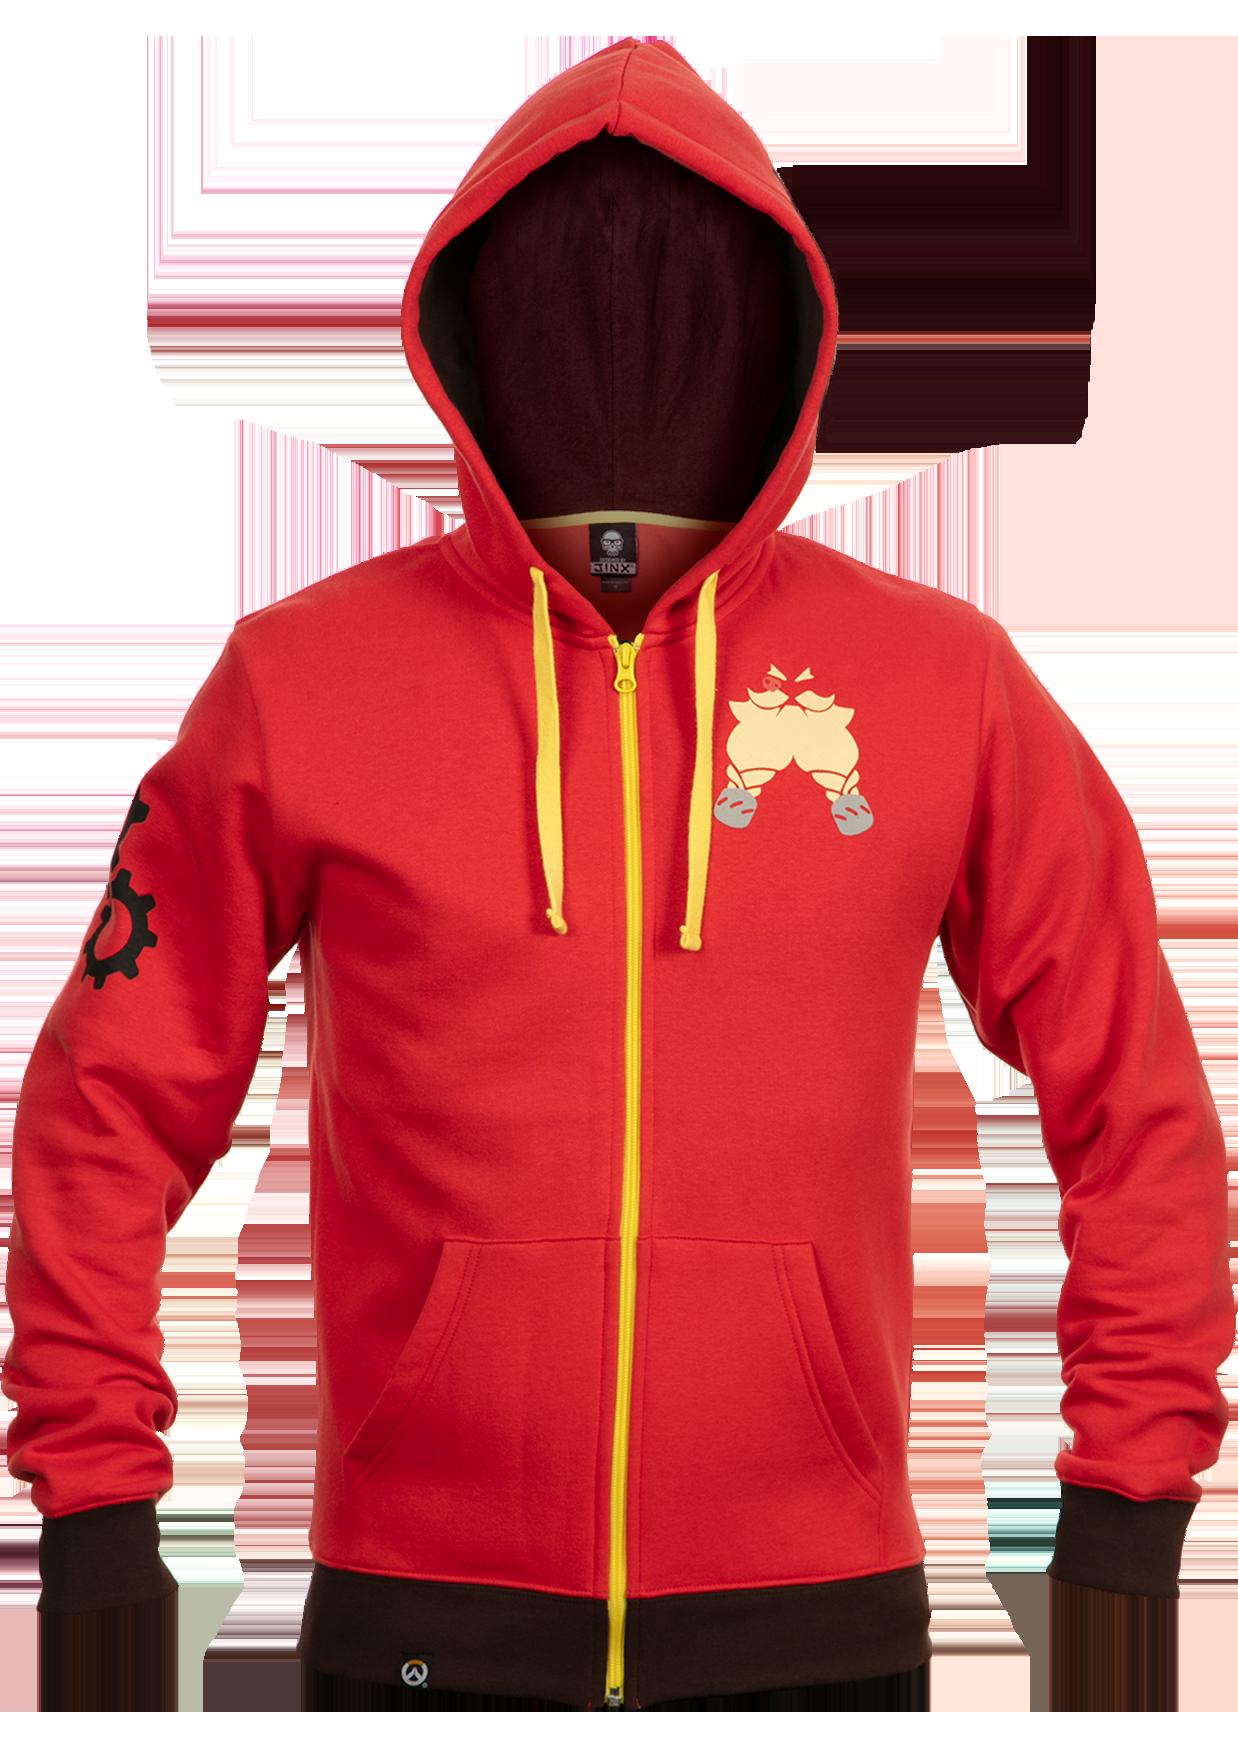 Product image of the Overwatch Ultimate Torbjorn Zip-Up Hoodie